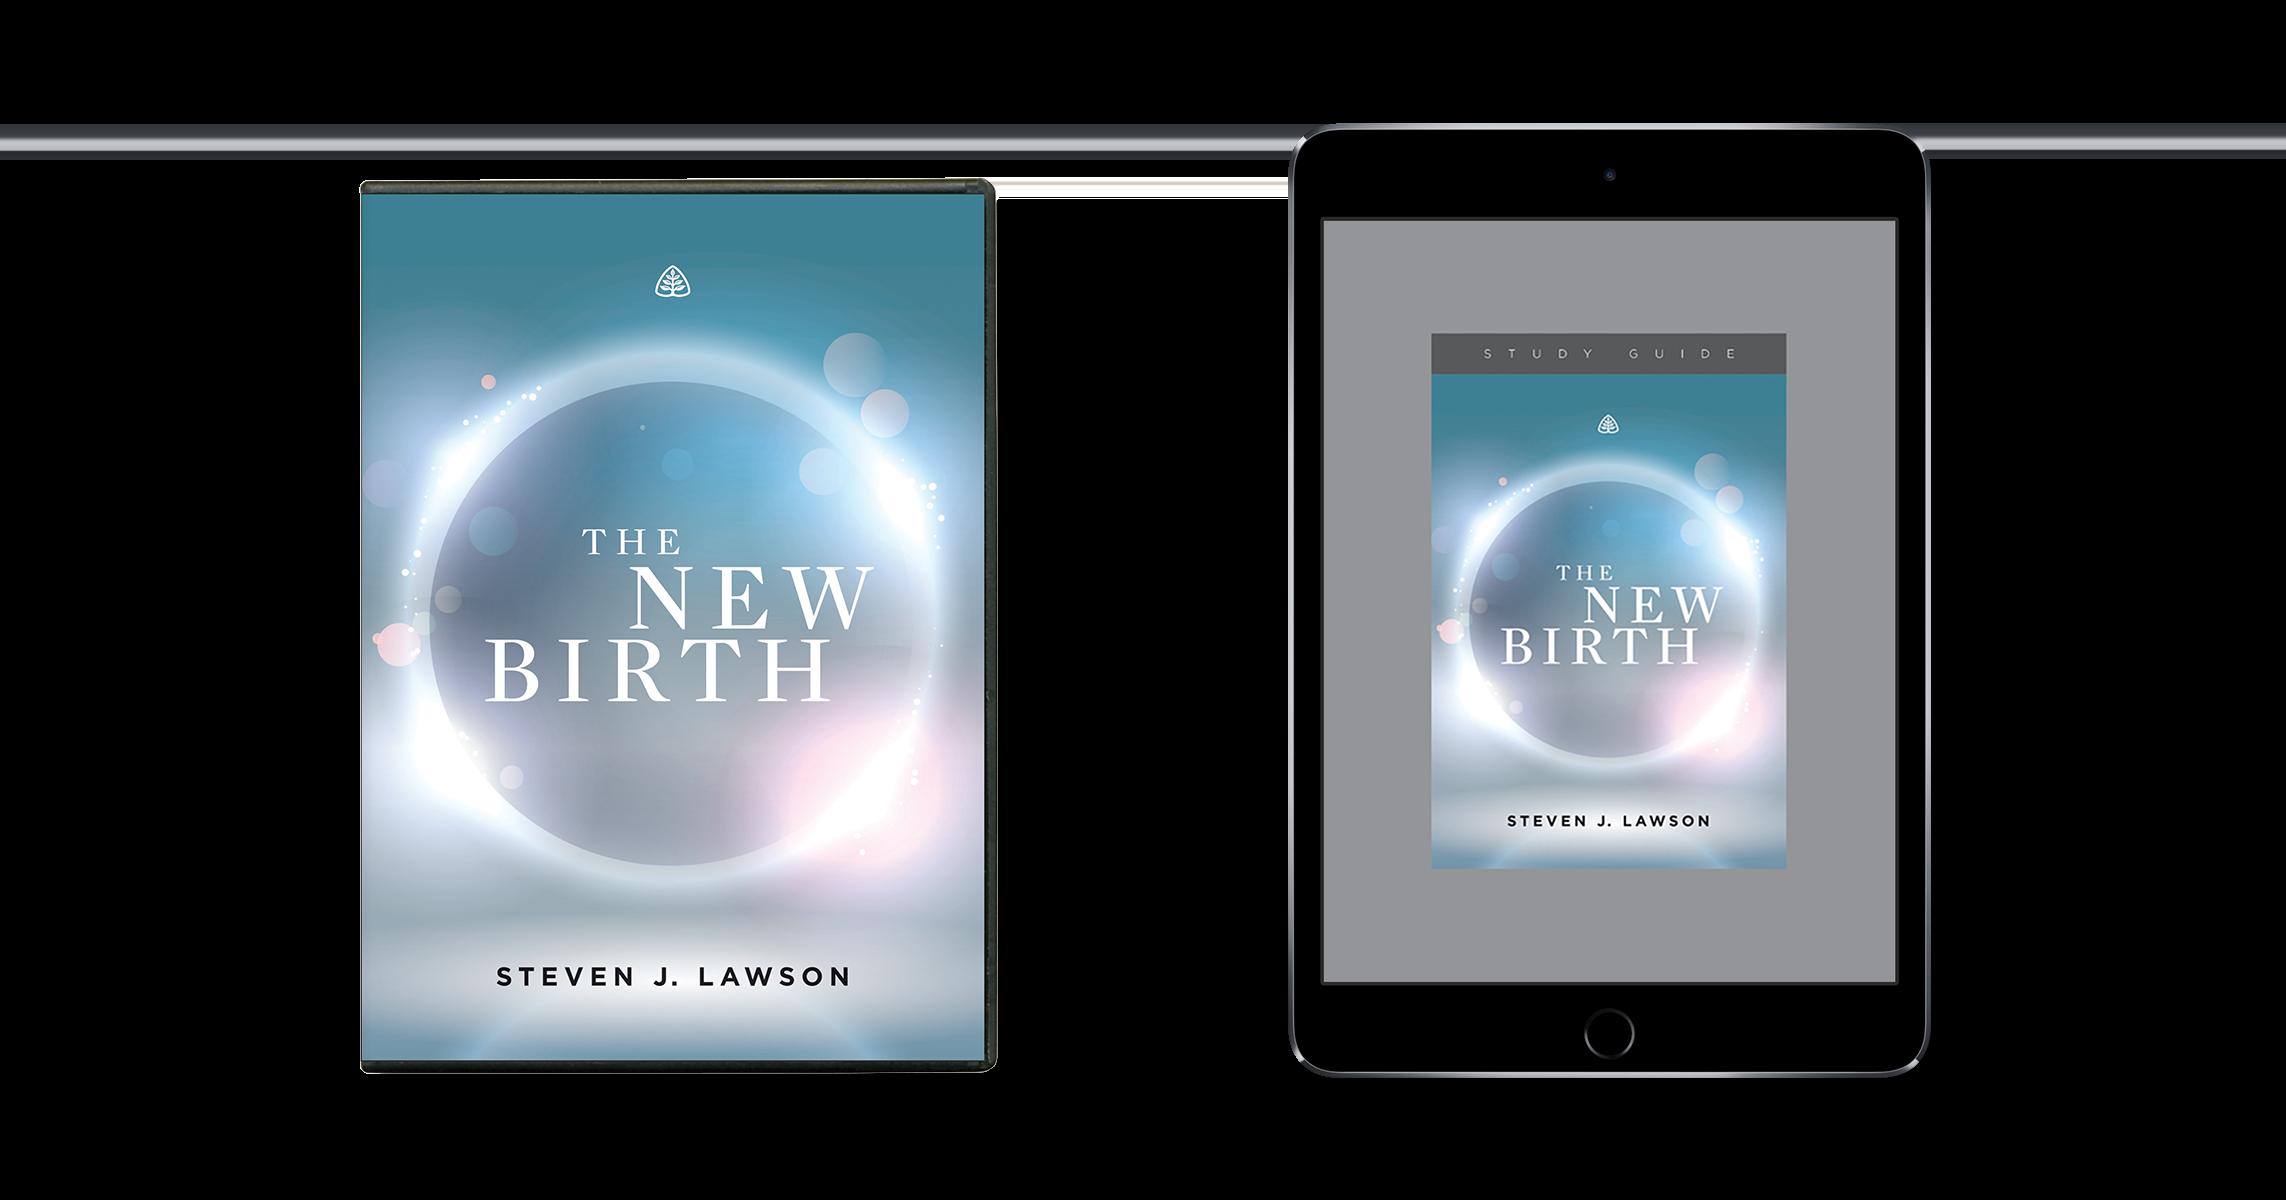 The New Birth